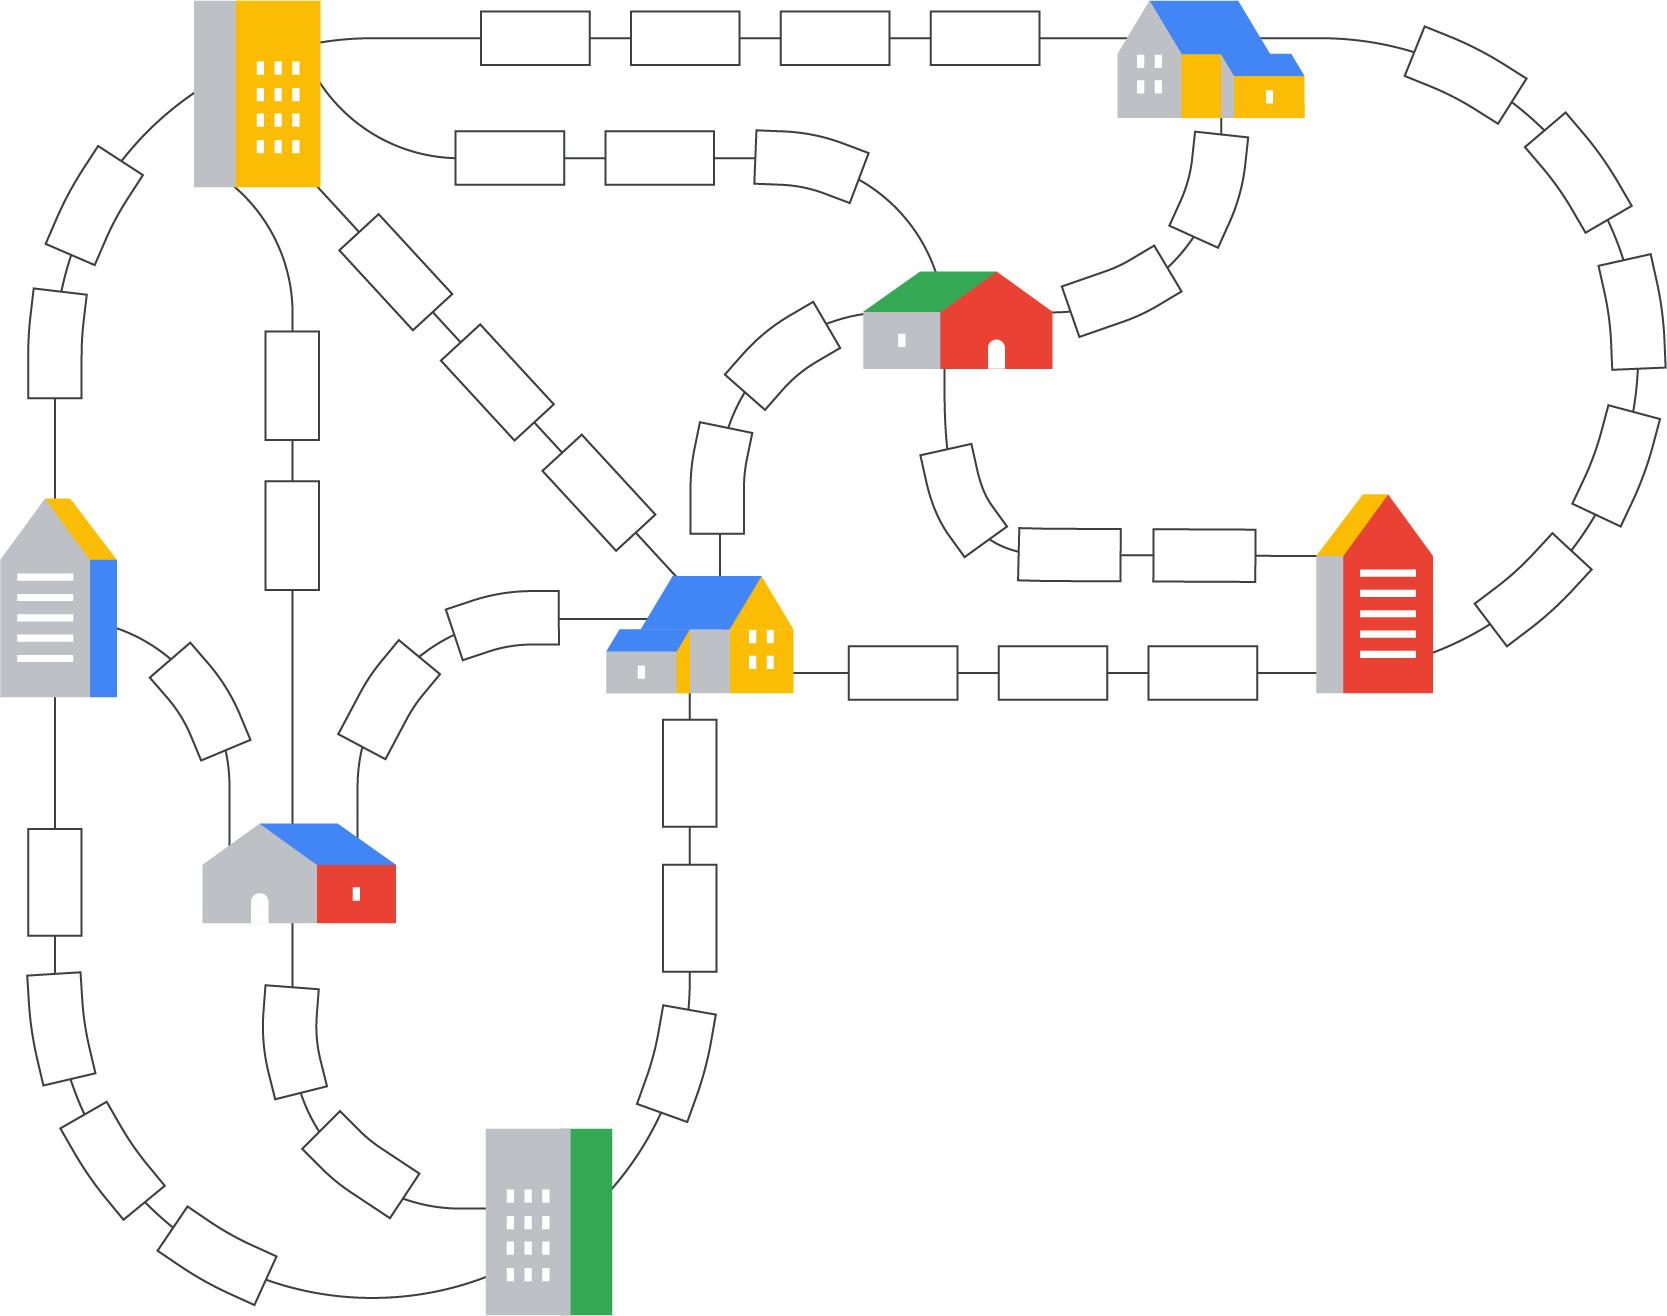 Mapa de edificios conectados con caminos